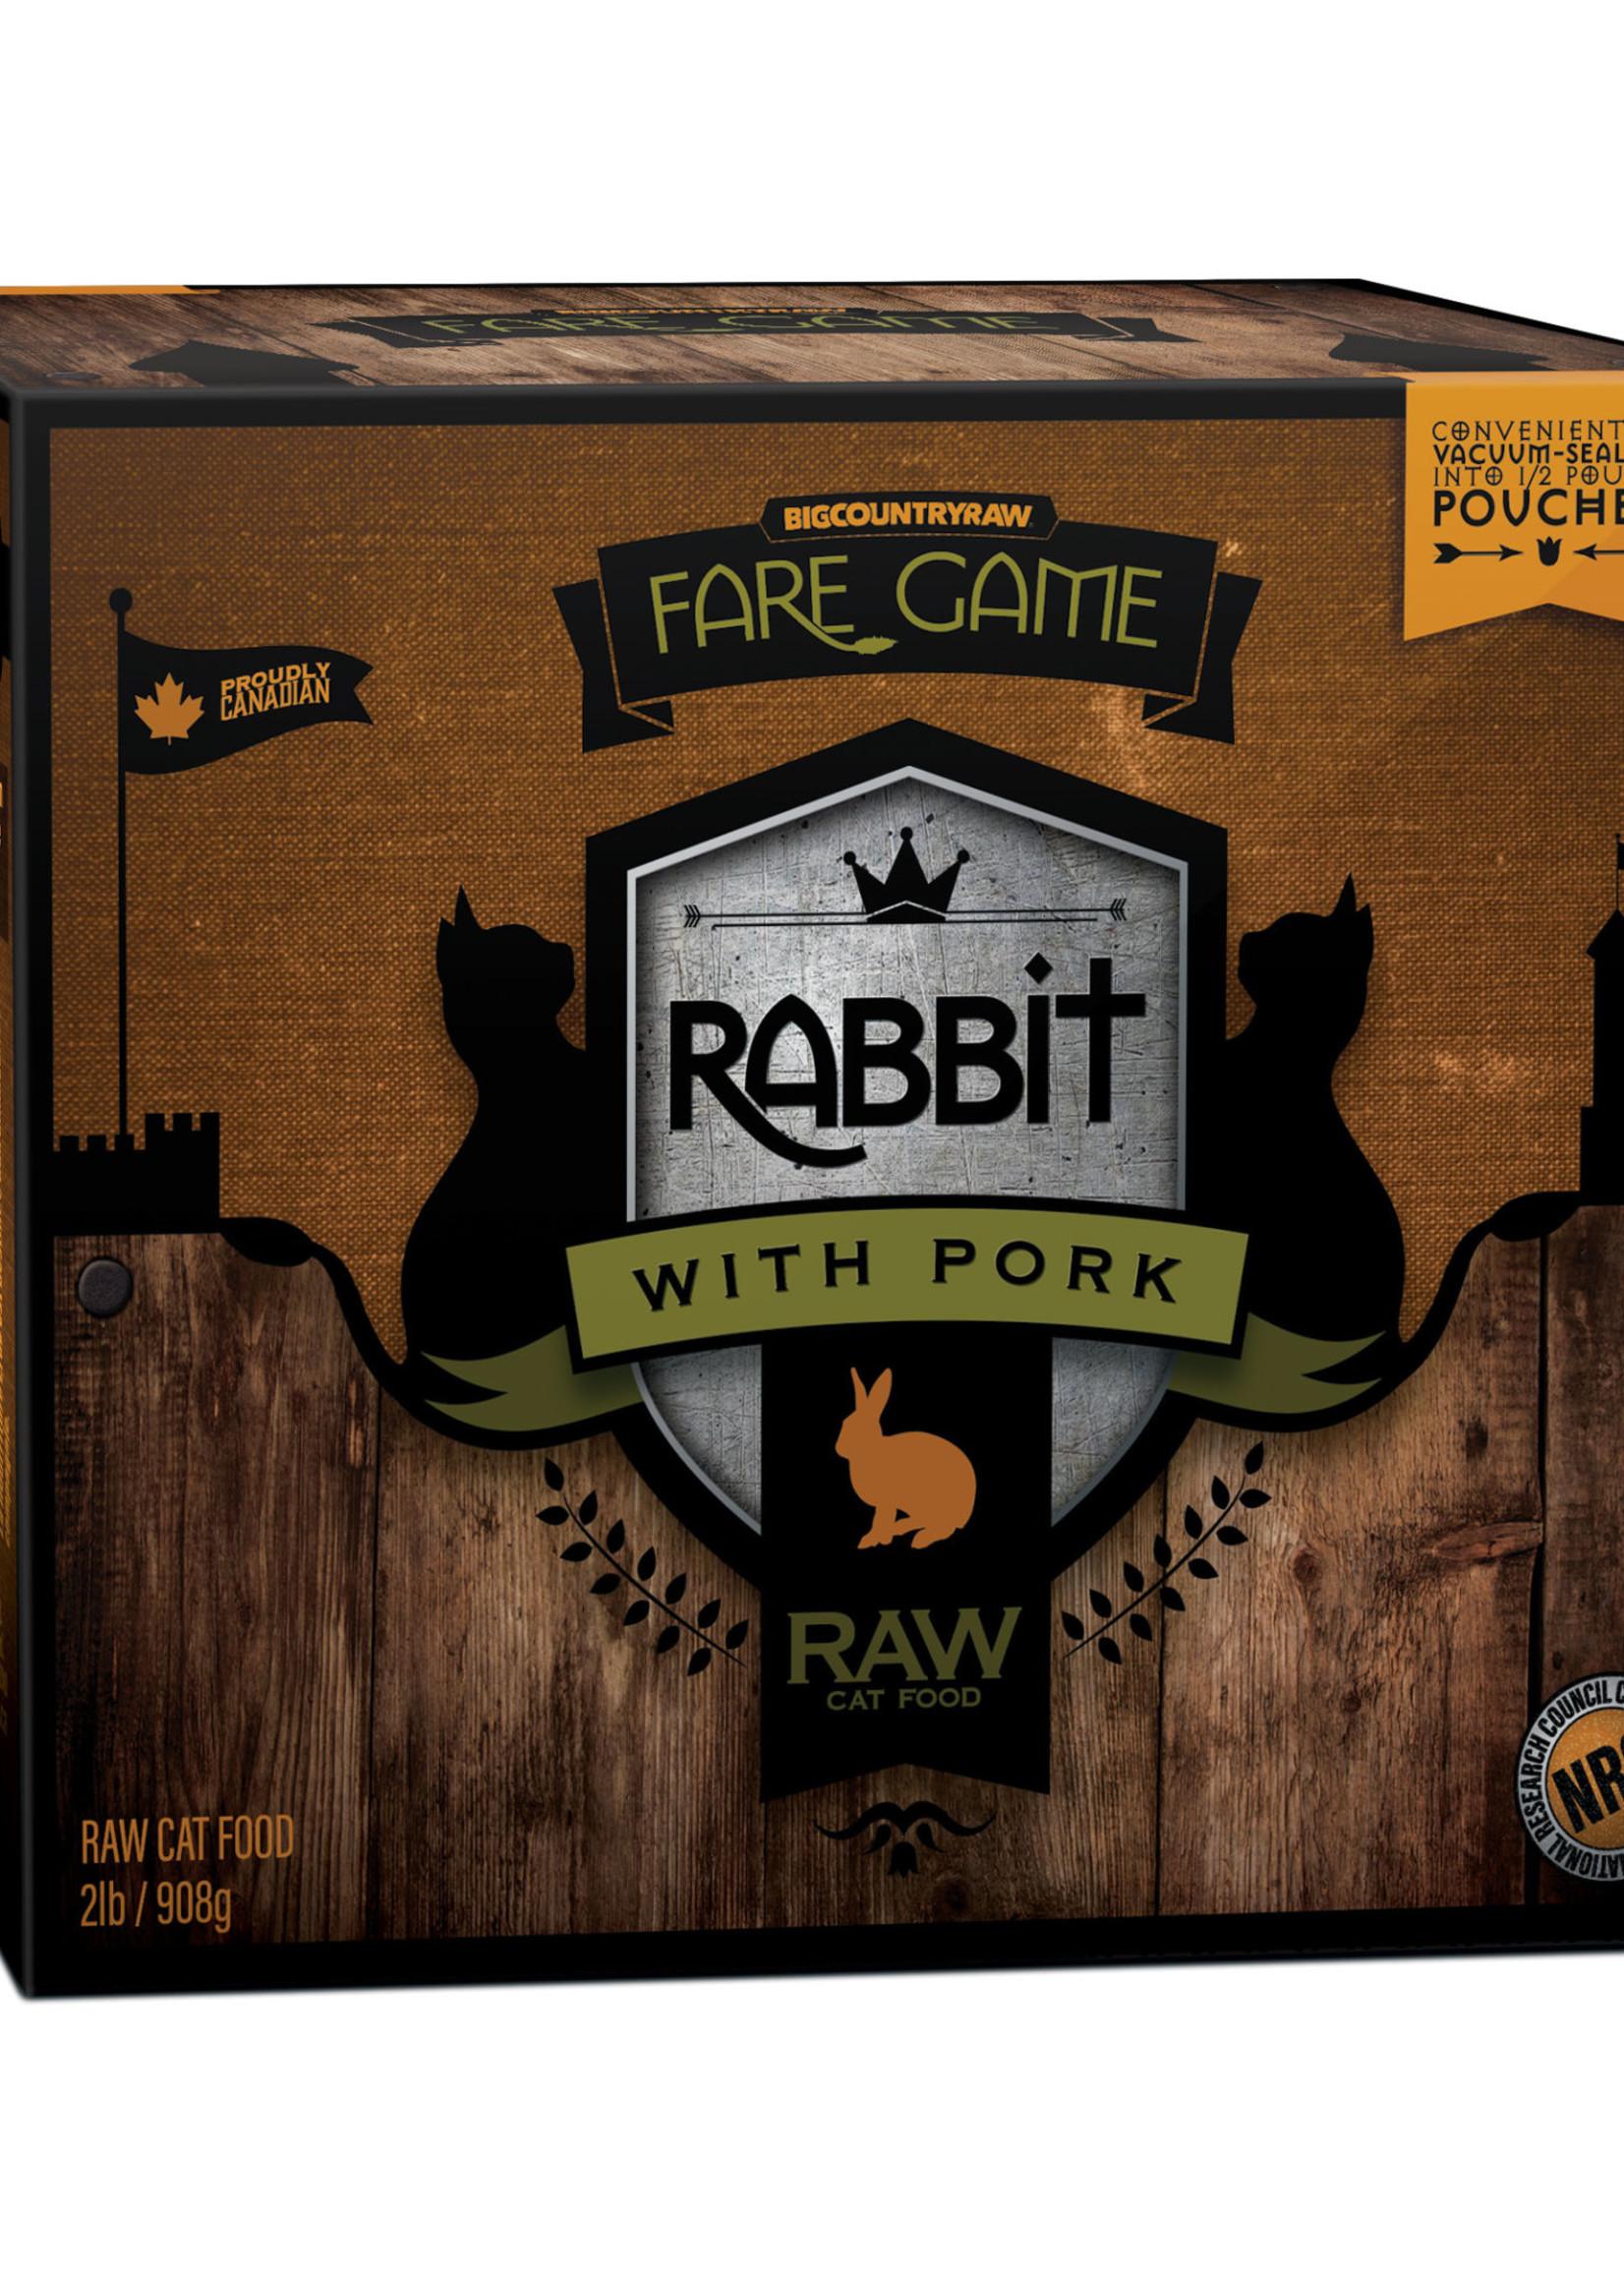 Fare Game Fare Game Rabbit with Pork 2lbs